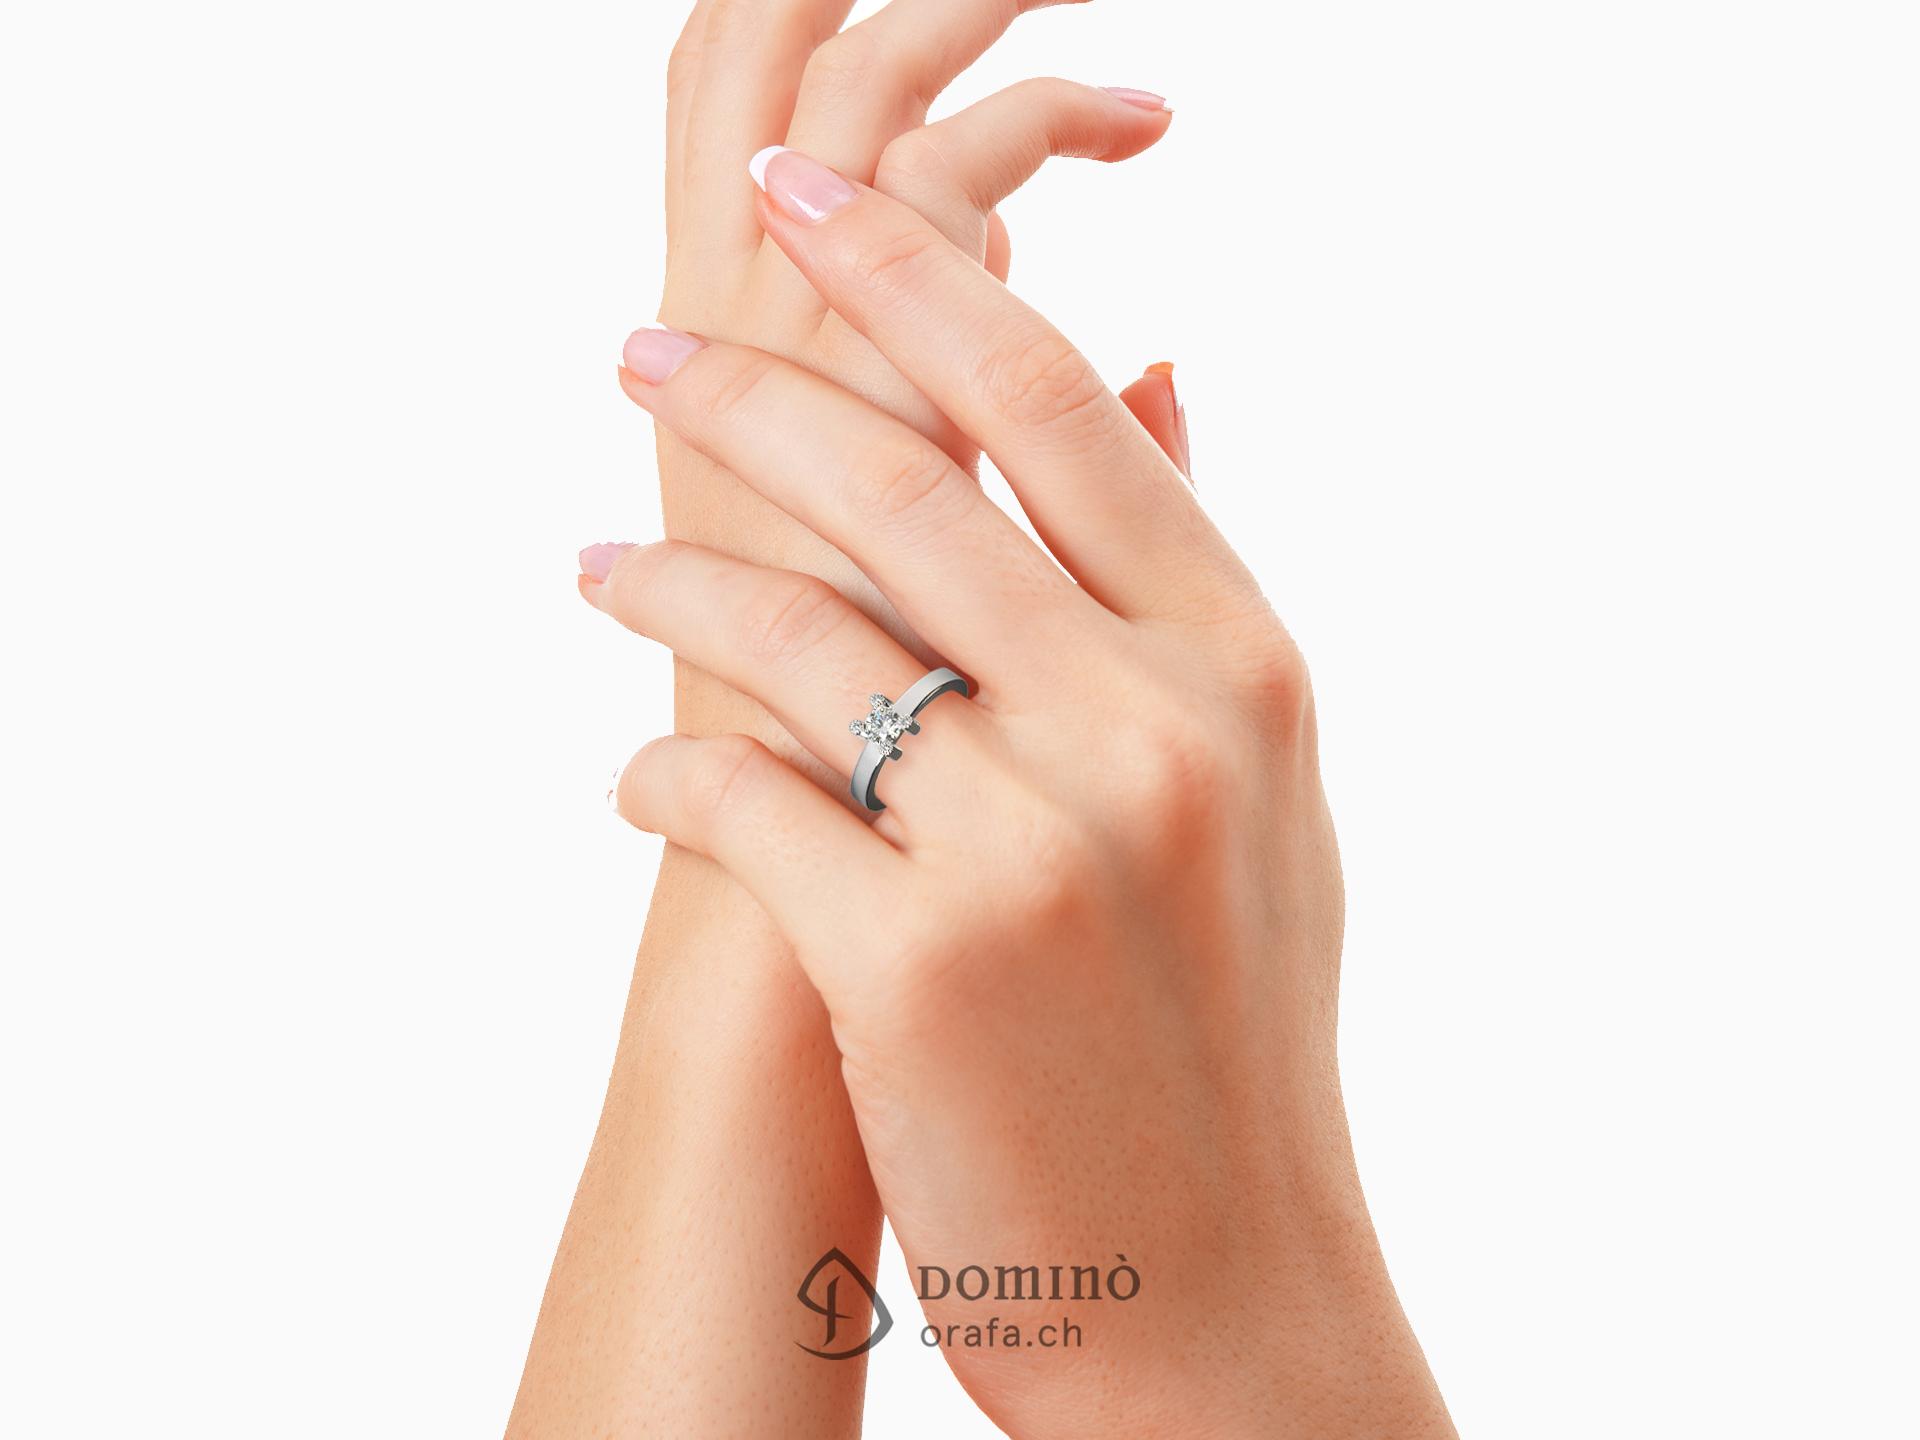 anello-diamante-centrale-4-diamanti-griffes-3